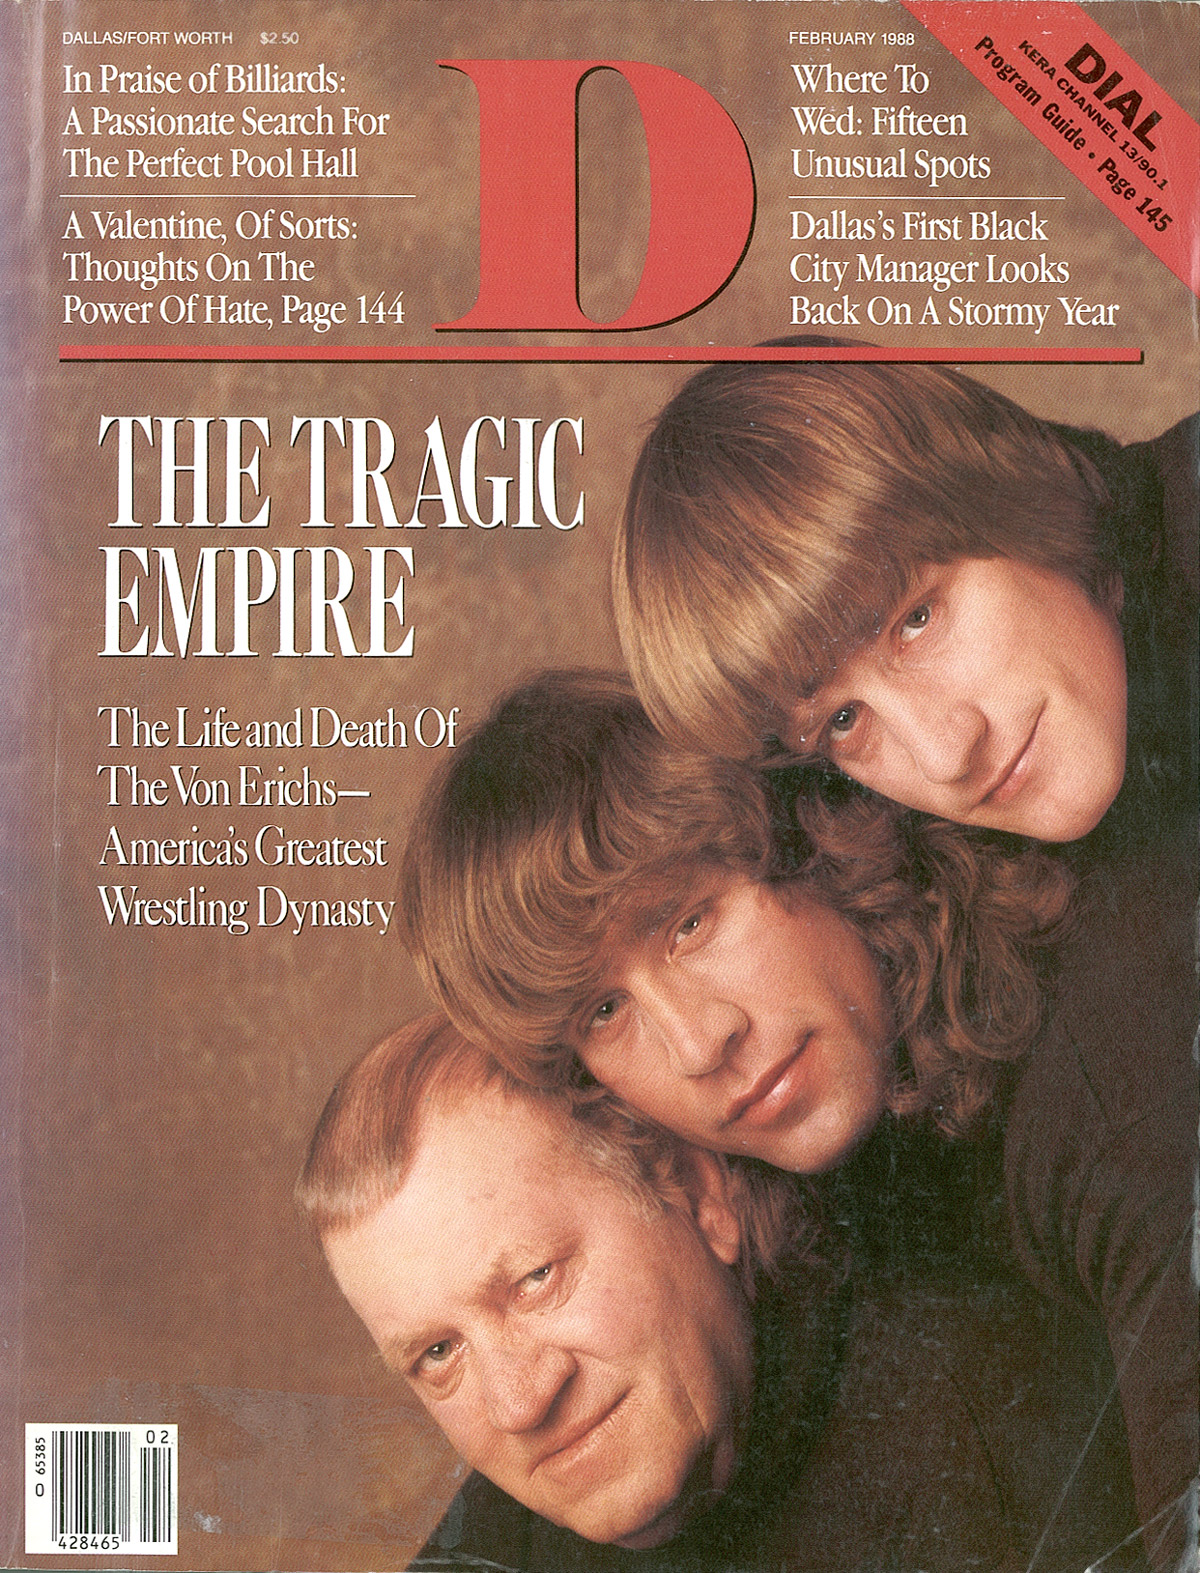 February 1988 cover